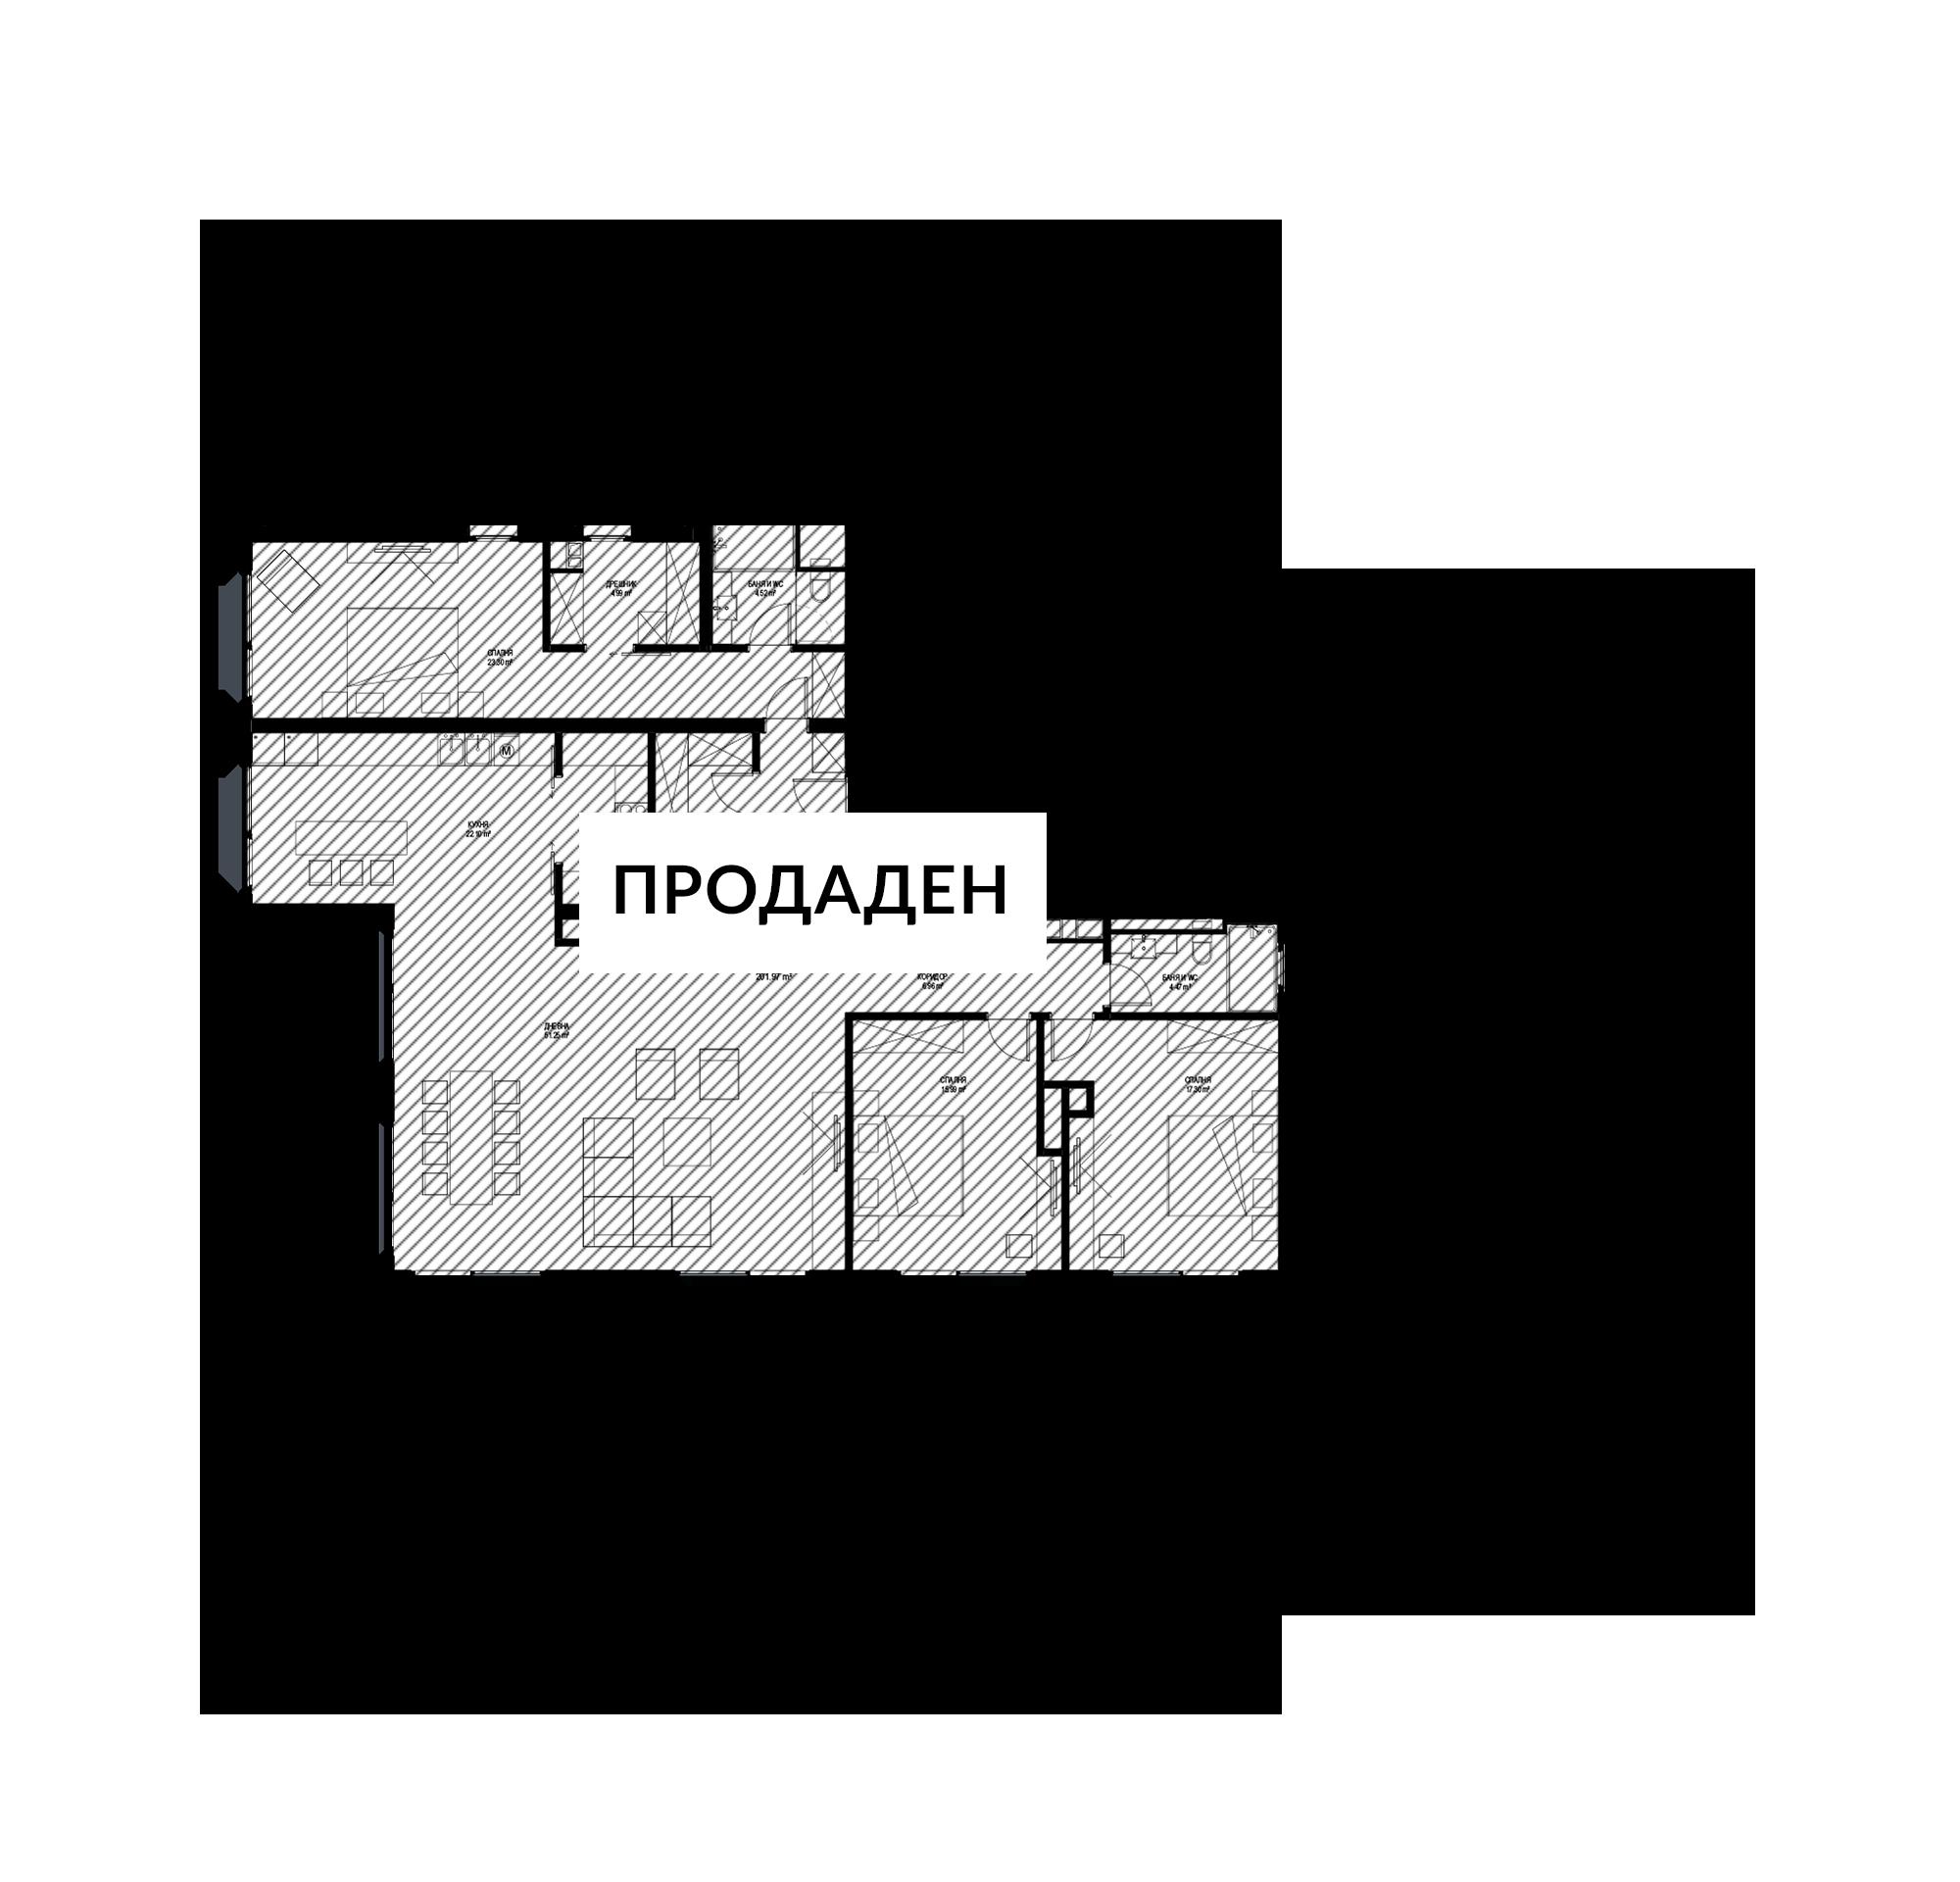 A - Етаж 4 1